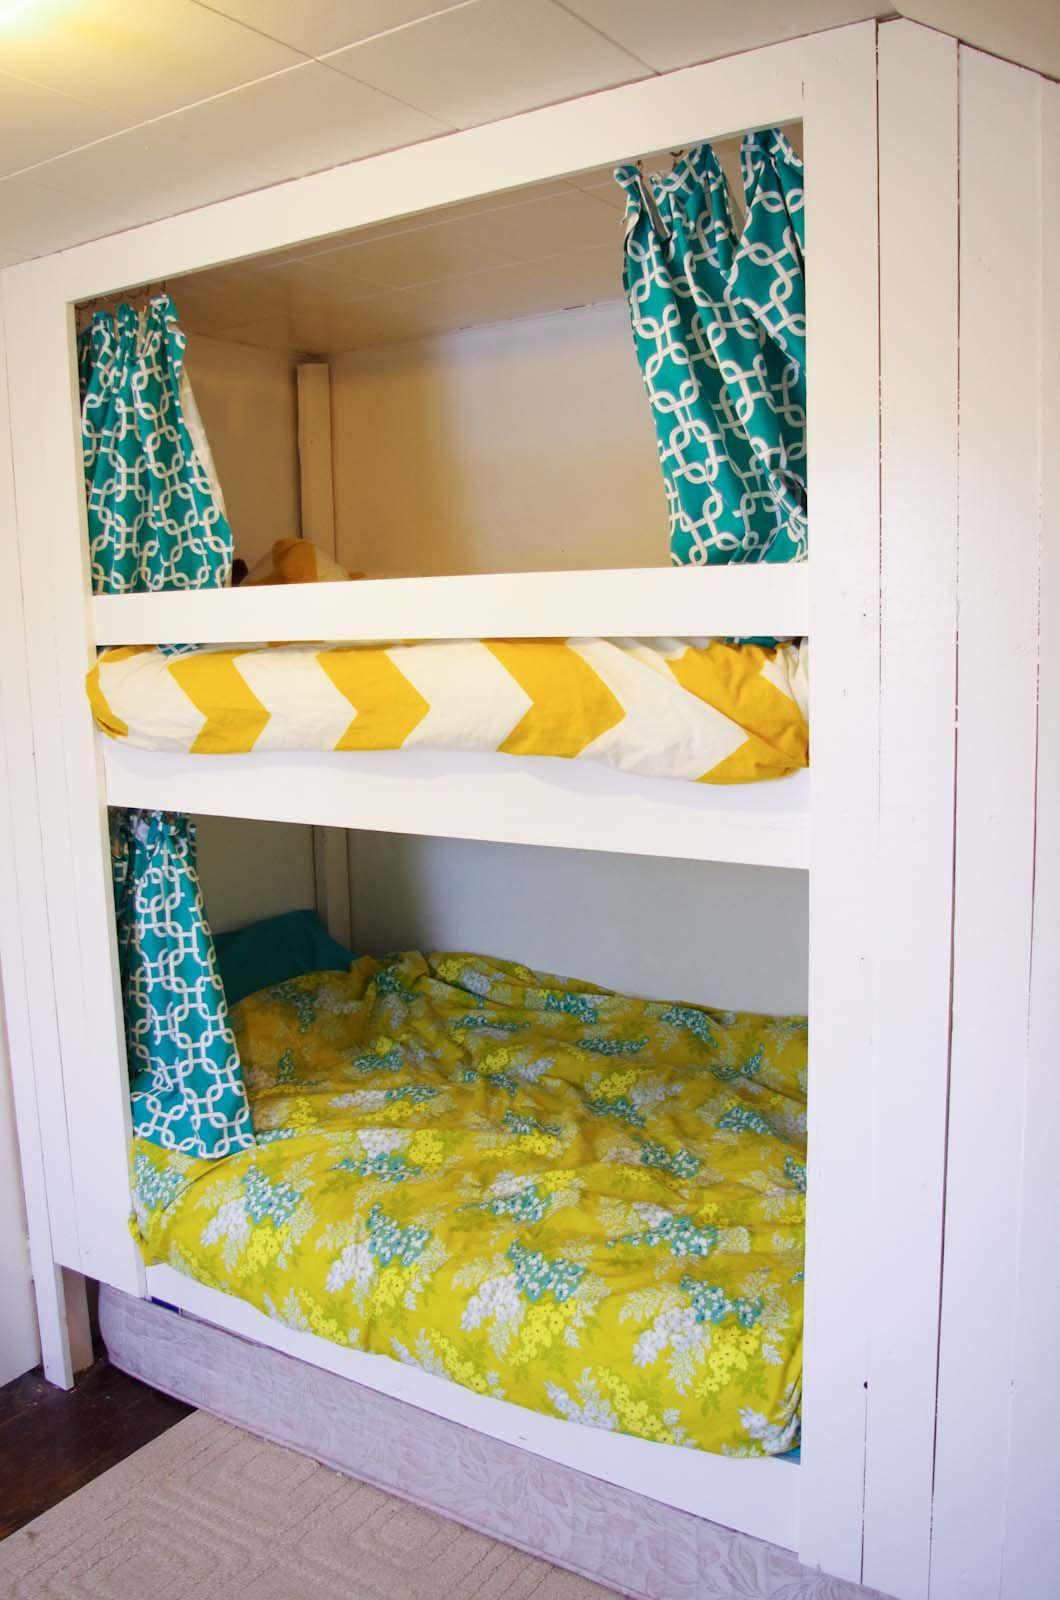 Best Diy With Images Camper Bunk Beds Bunk Beds Kids Bunk 400 x 300